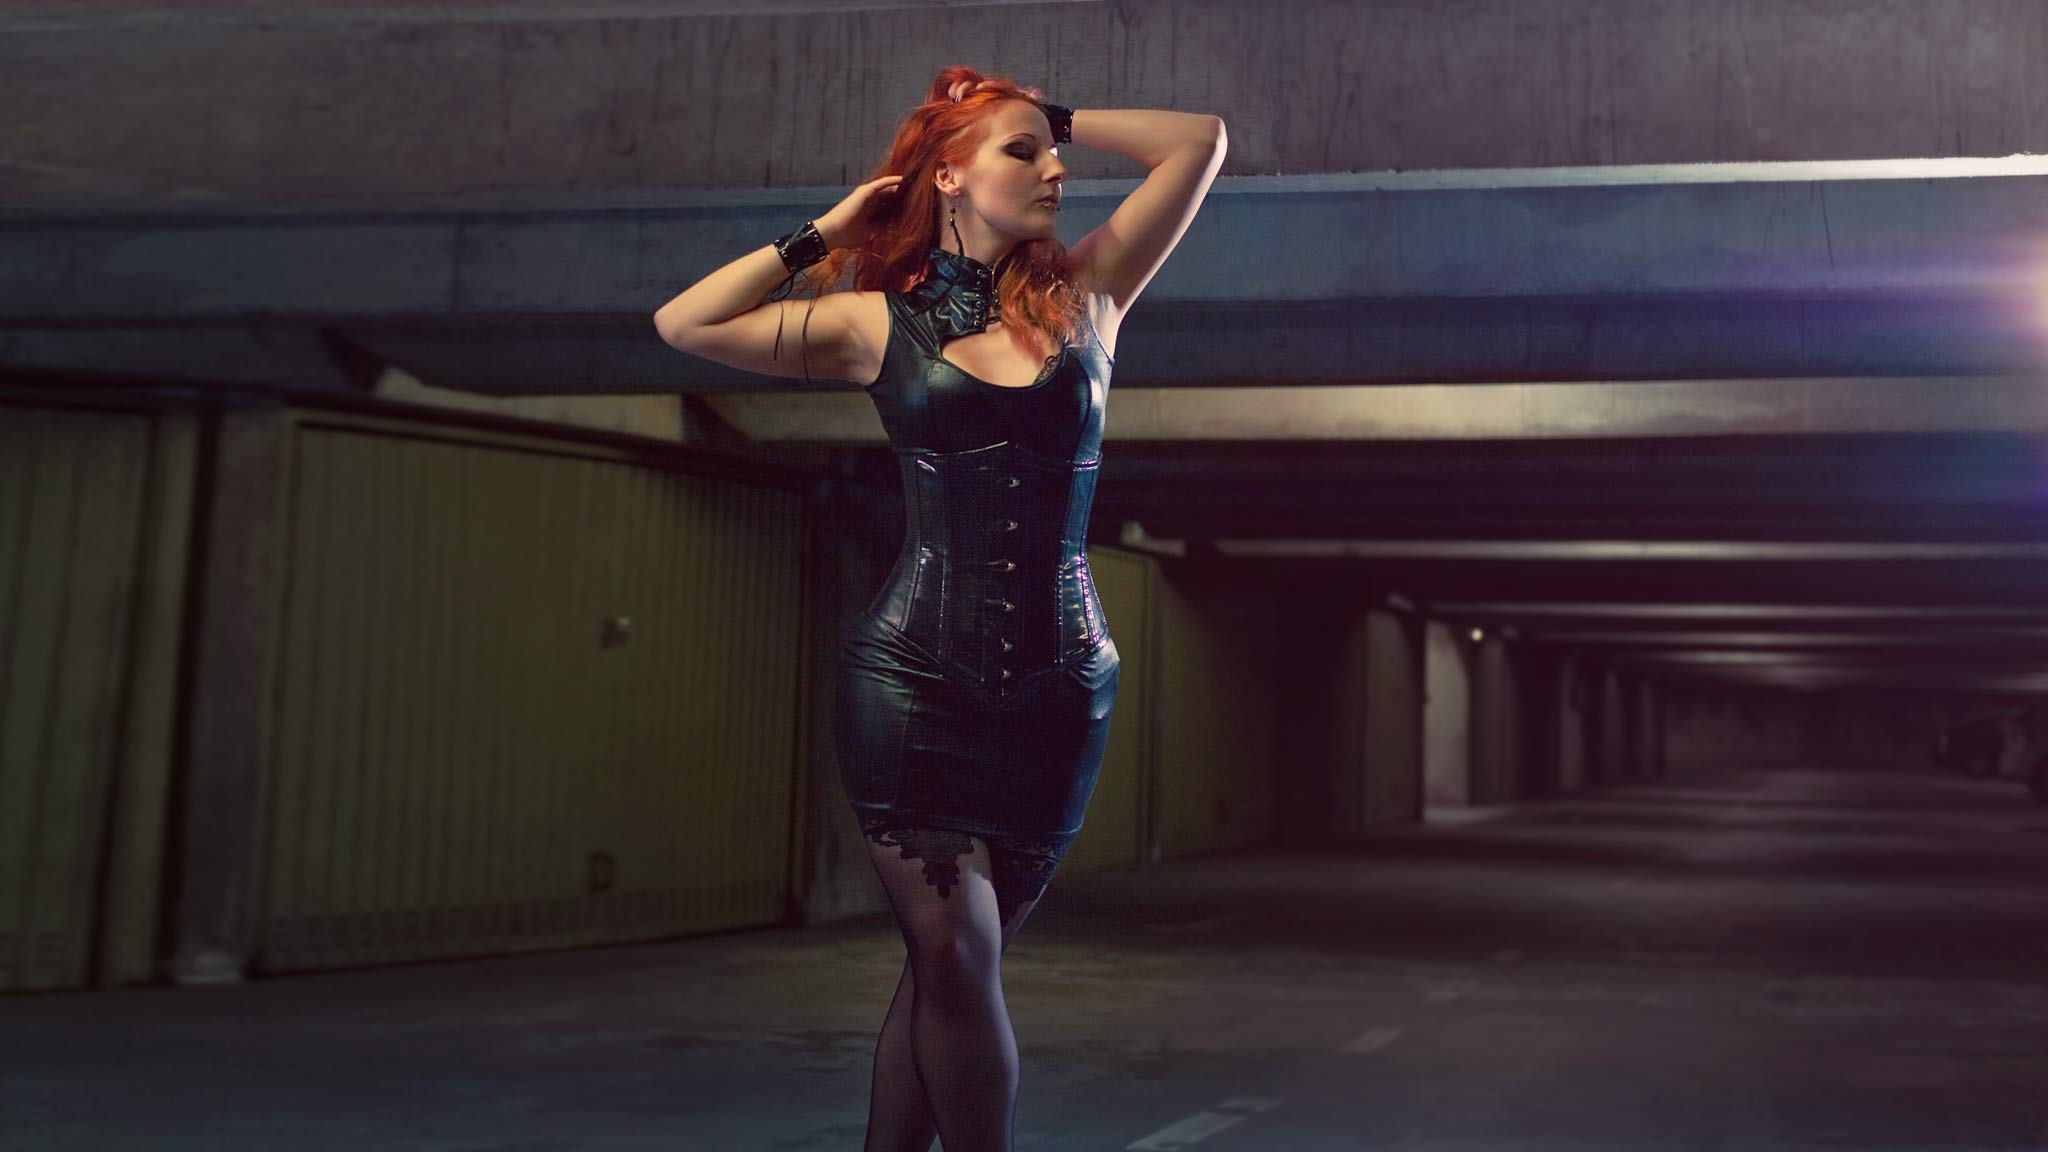 portrait alternative model redhead girl sexy latex dark beauty leather cuir underground